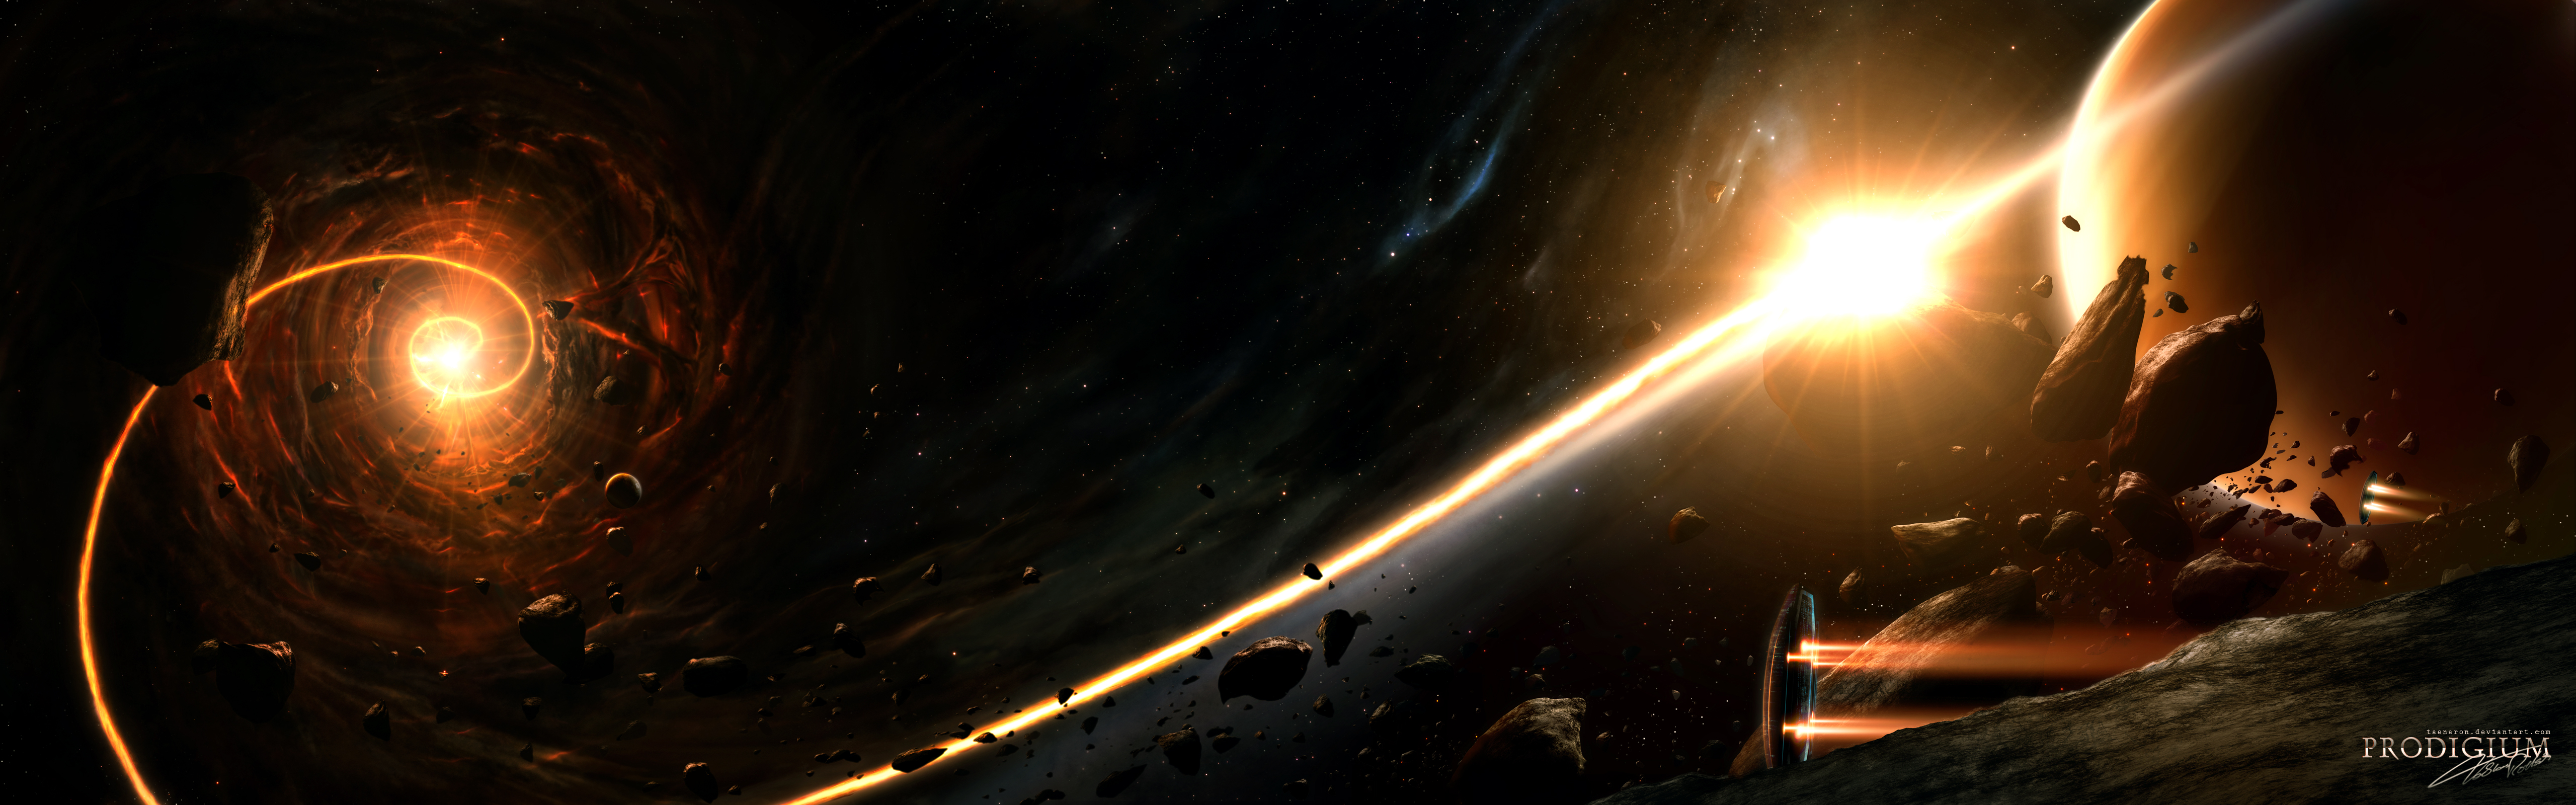 Planet 5120x1600